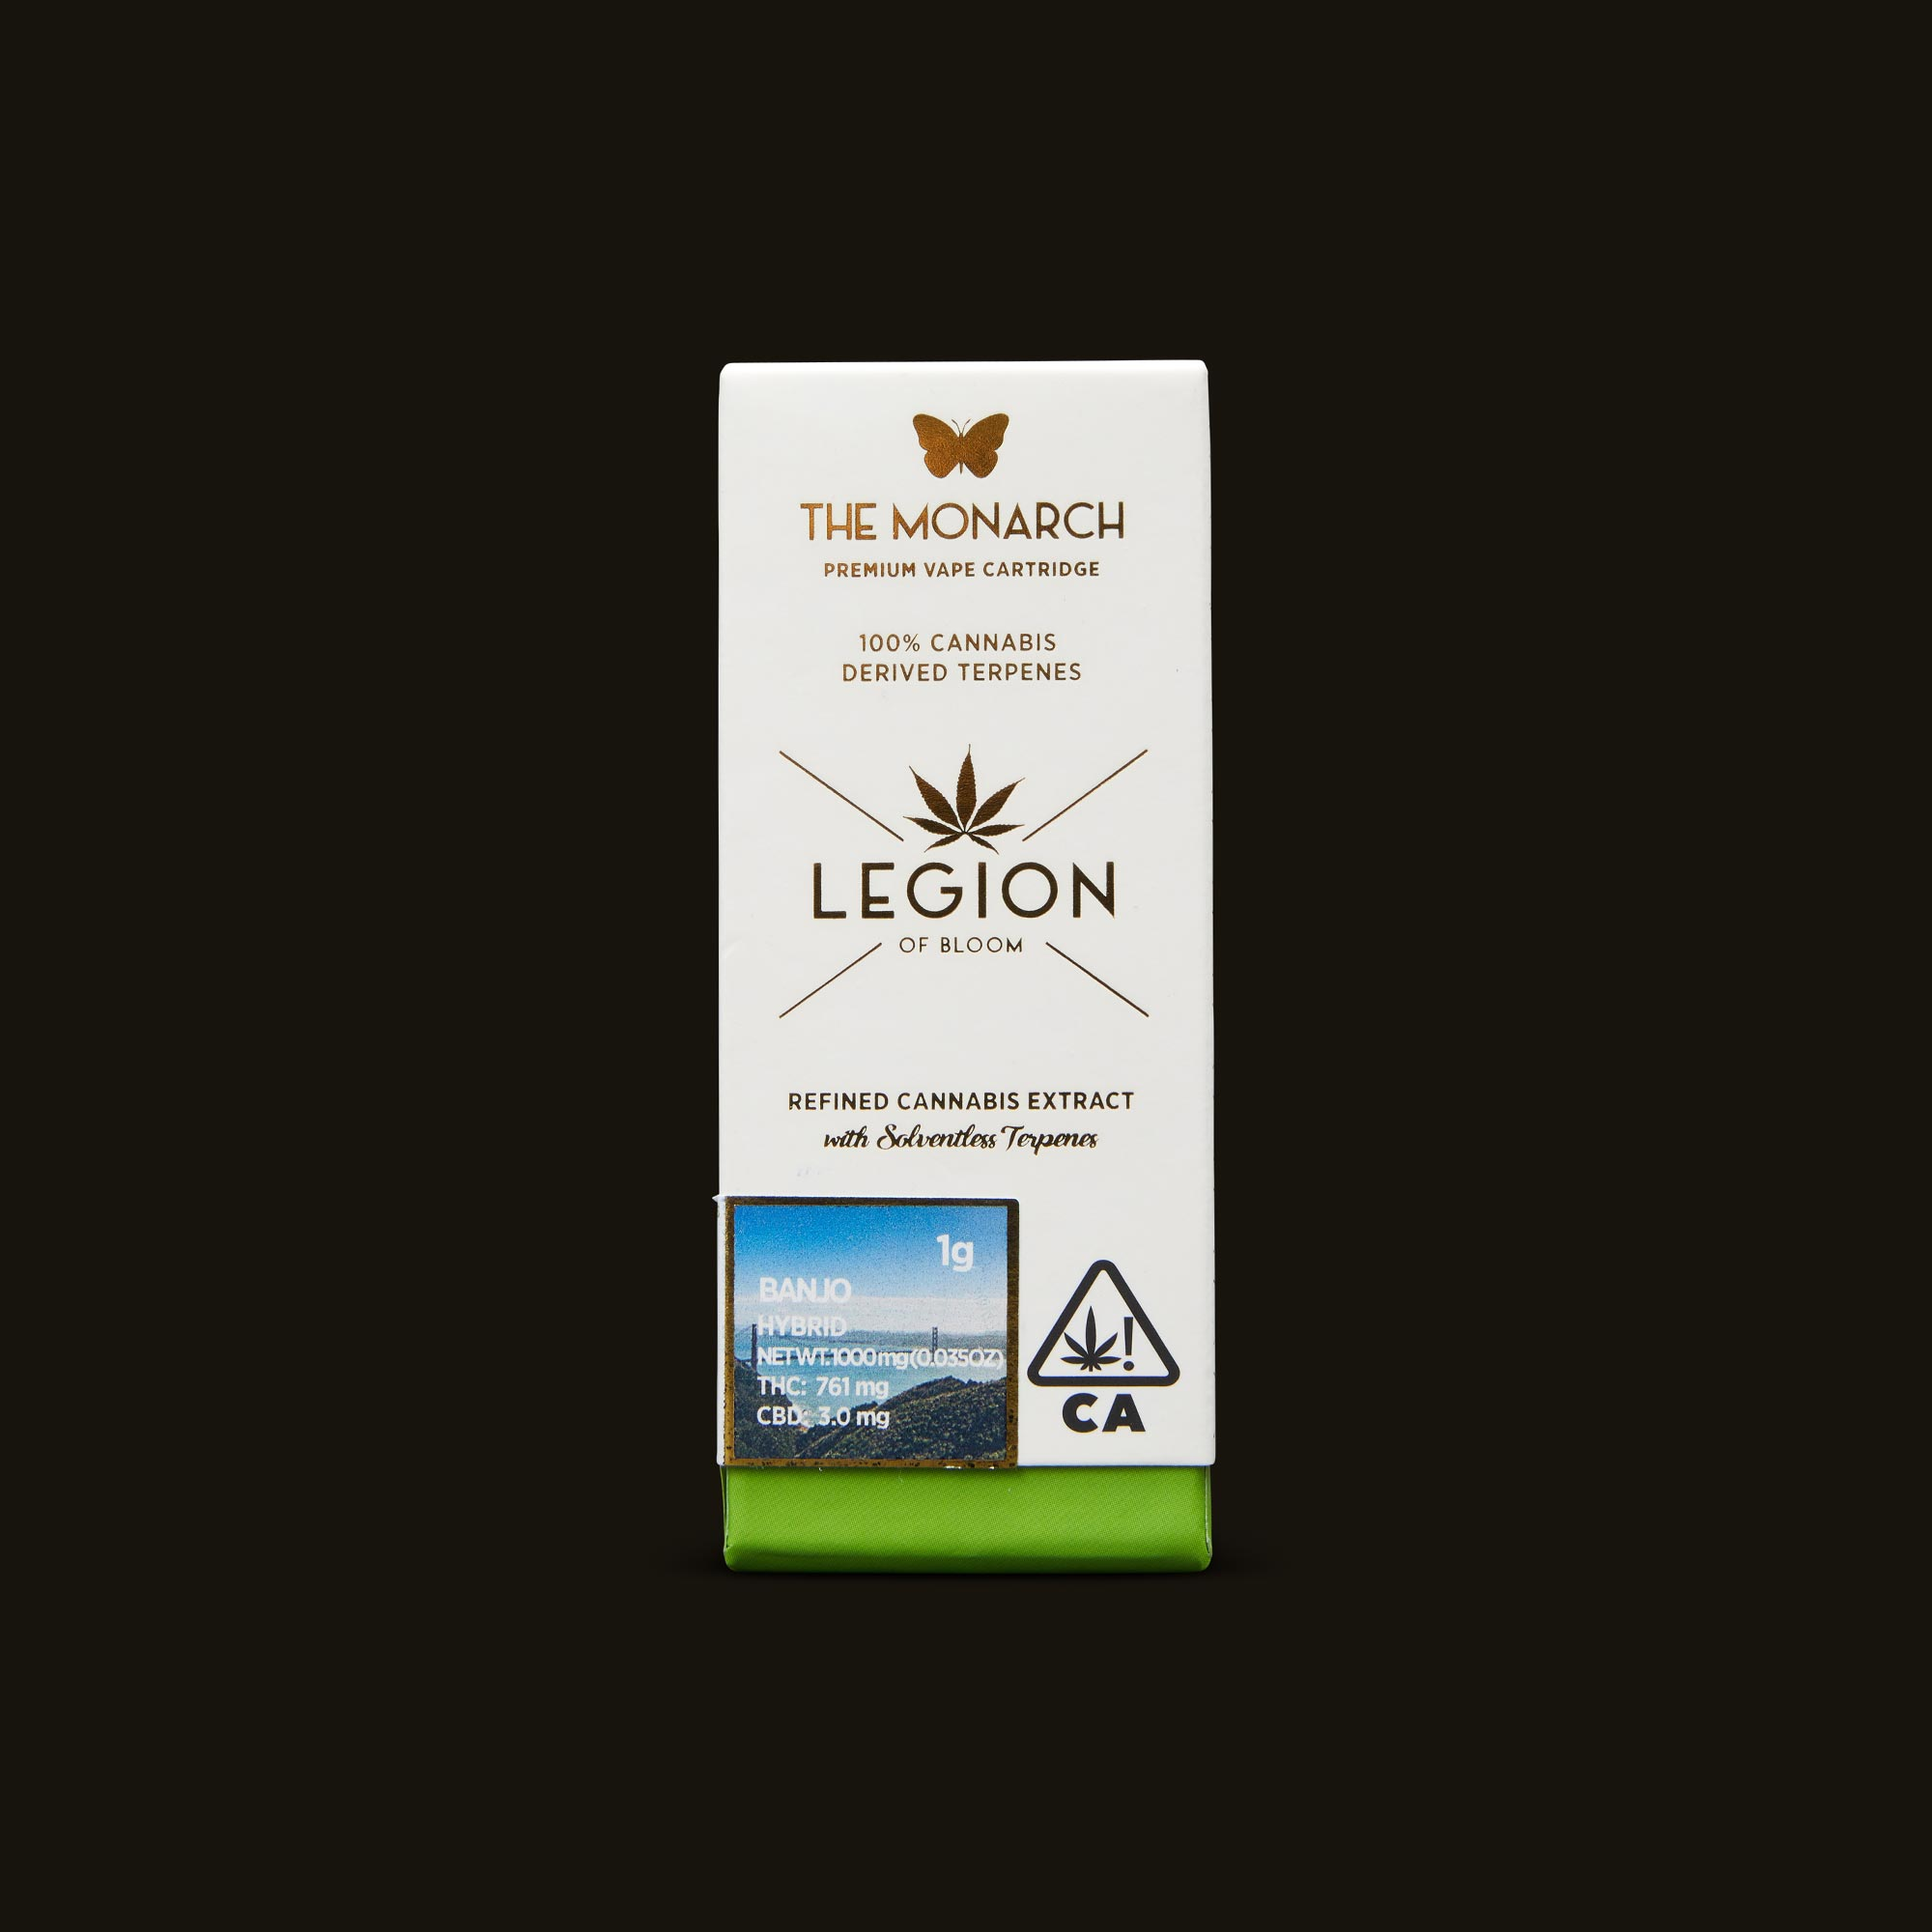 Legion of Bloom Banjo Monarch 1g Front Packaging